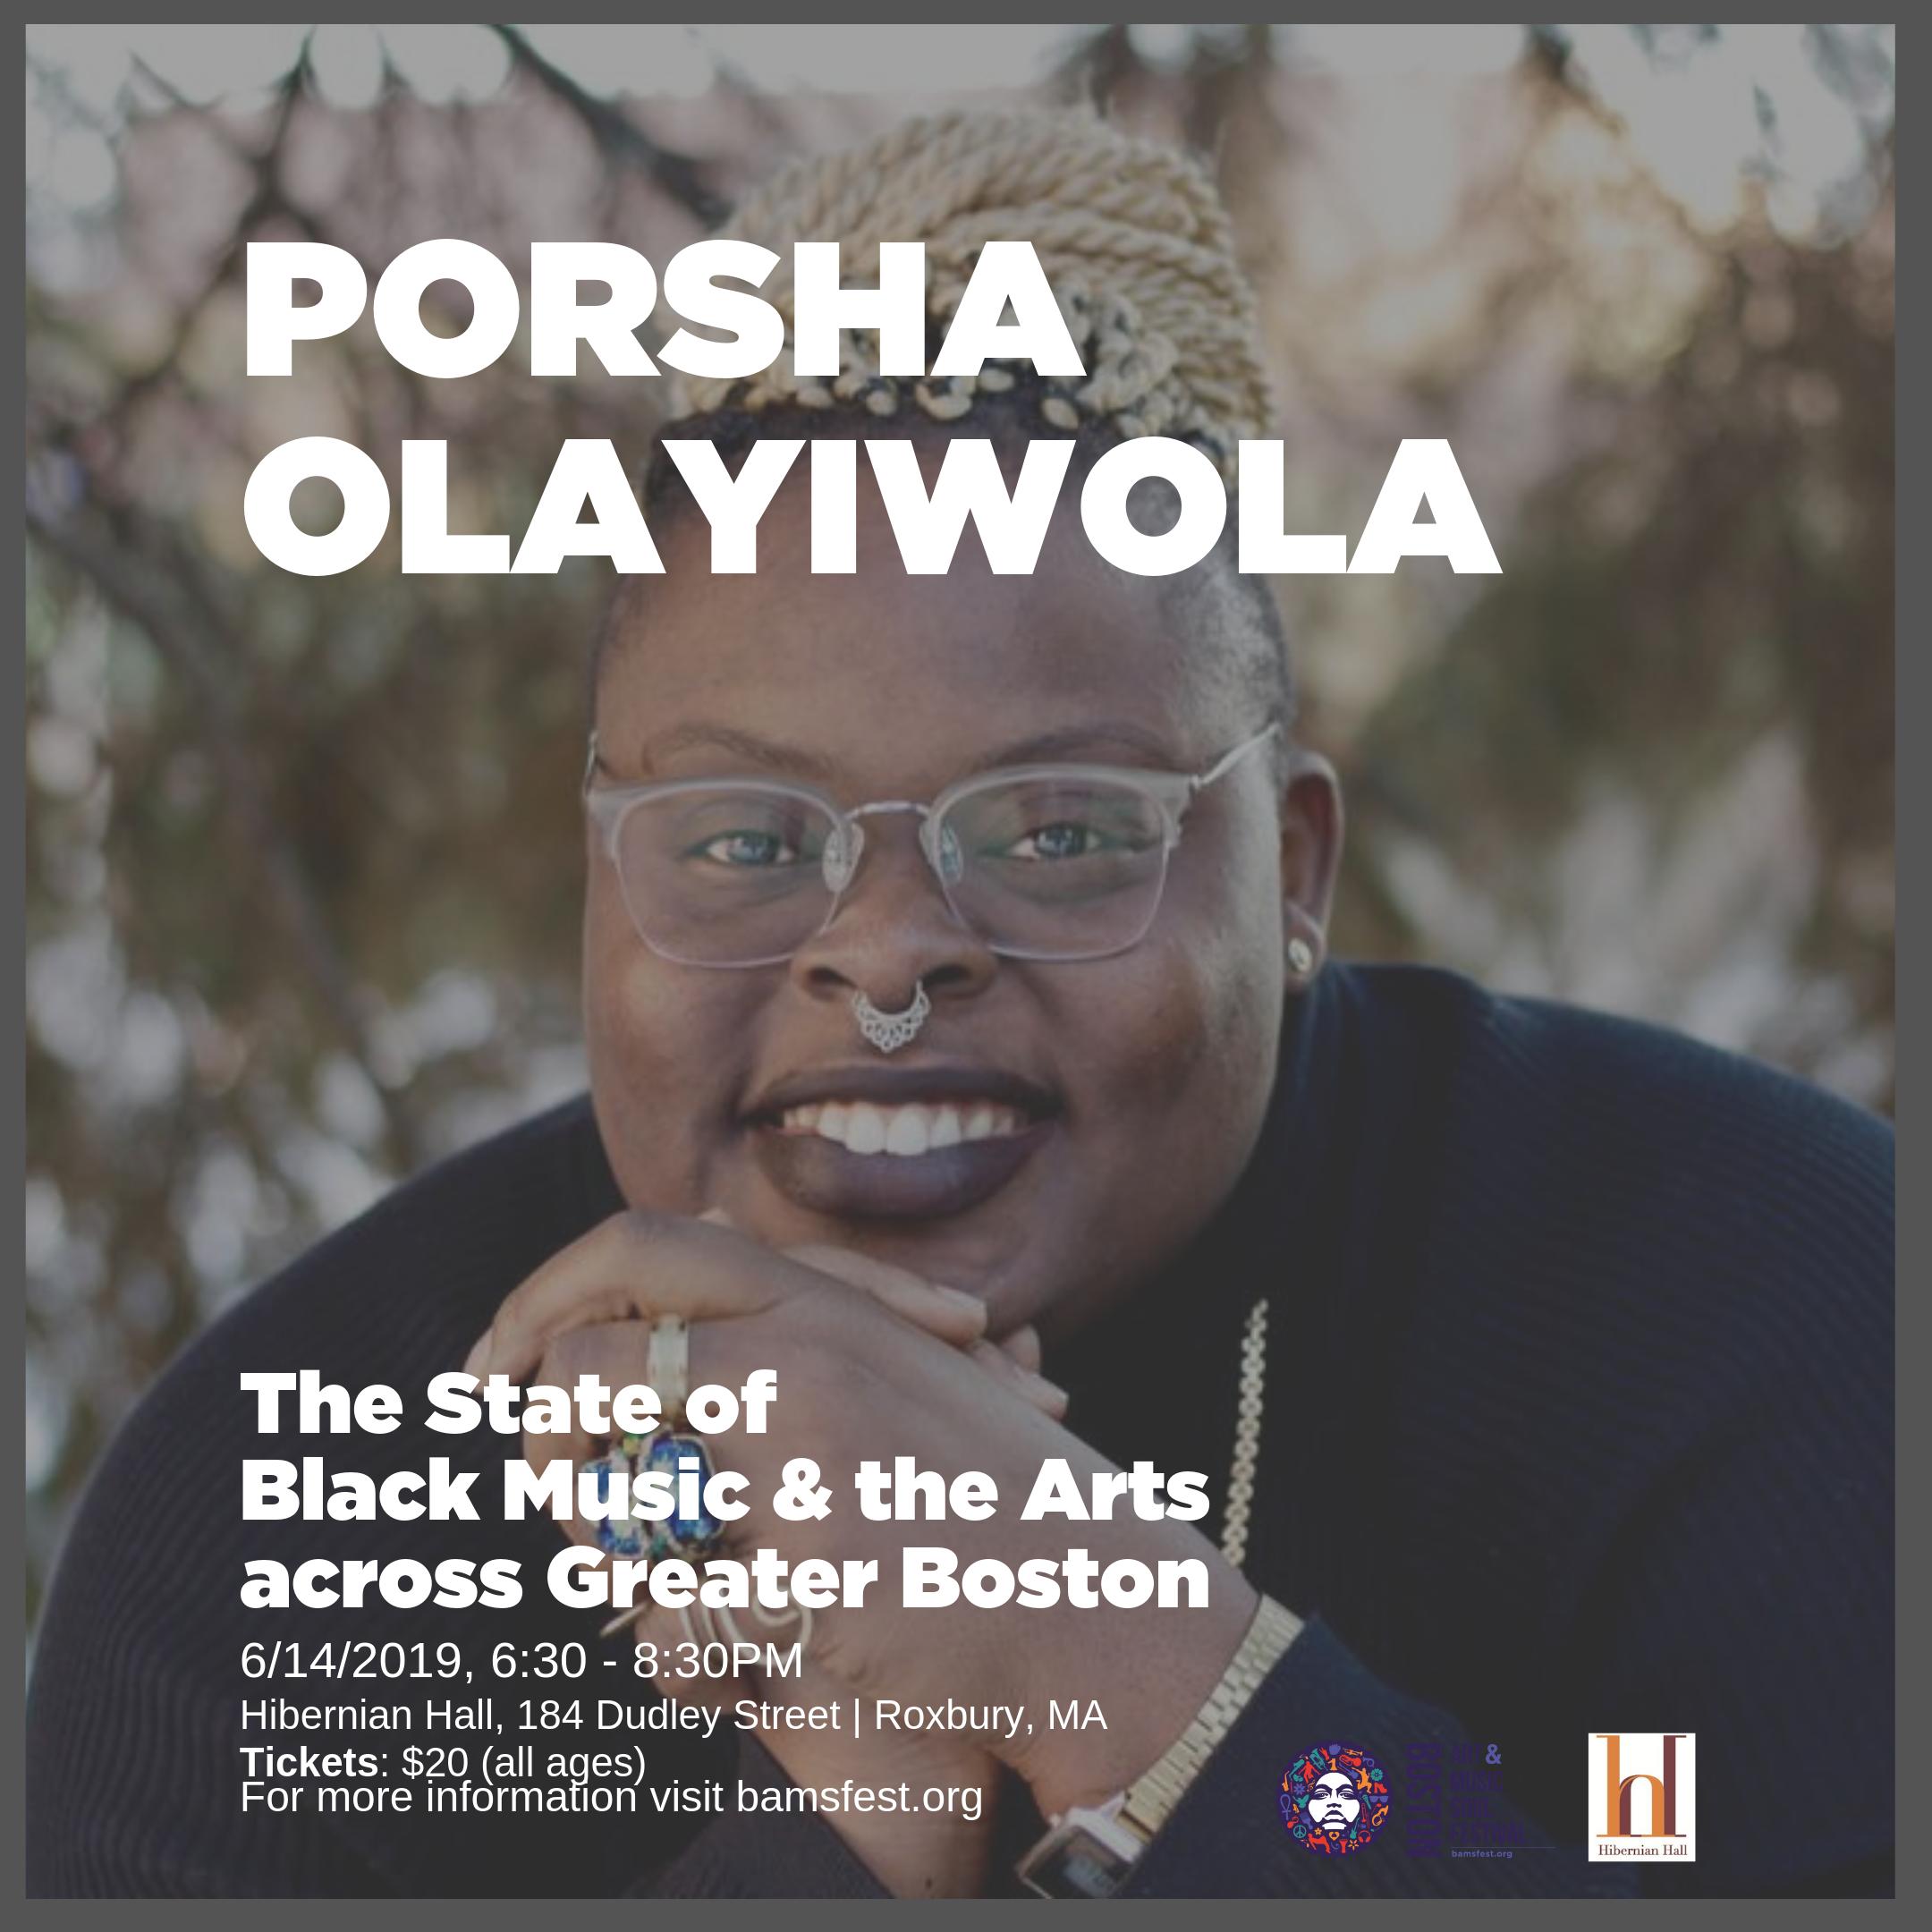 Instagram_6_14_2019 Porsha Olayiwola